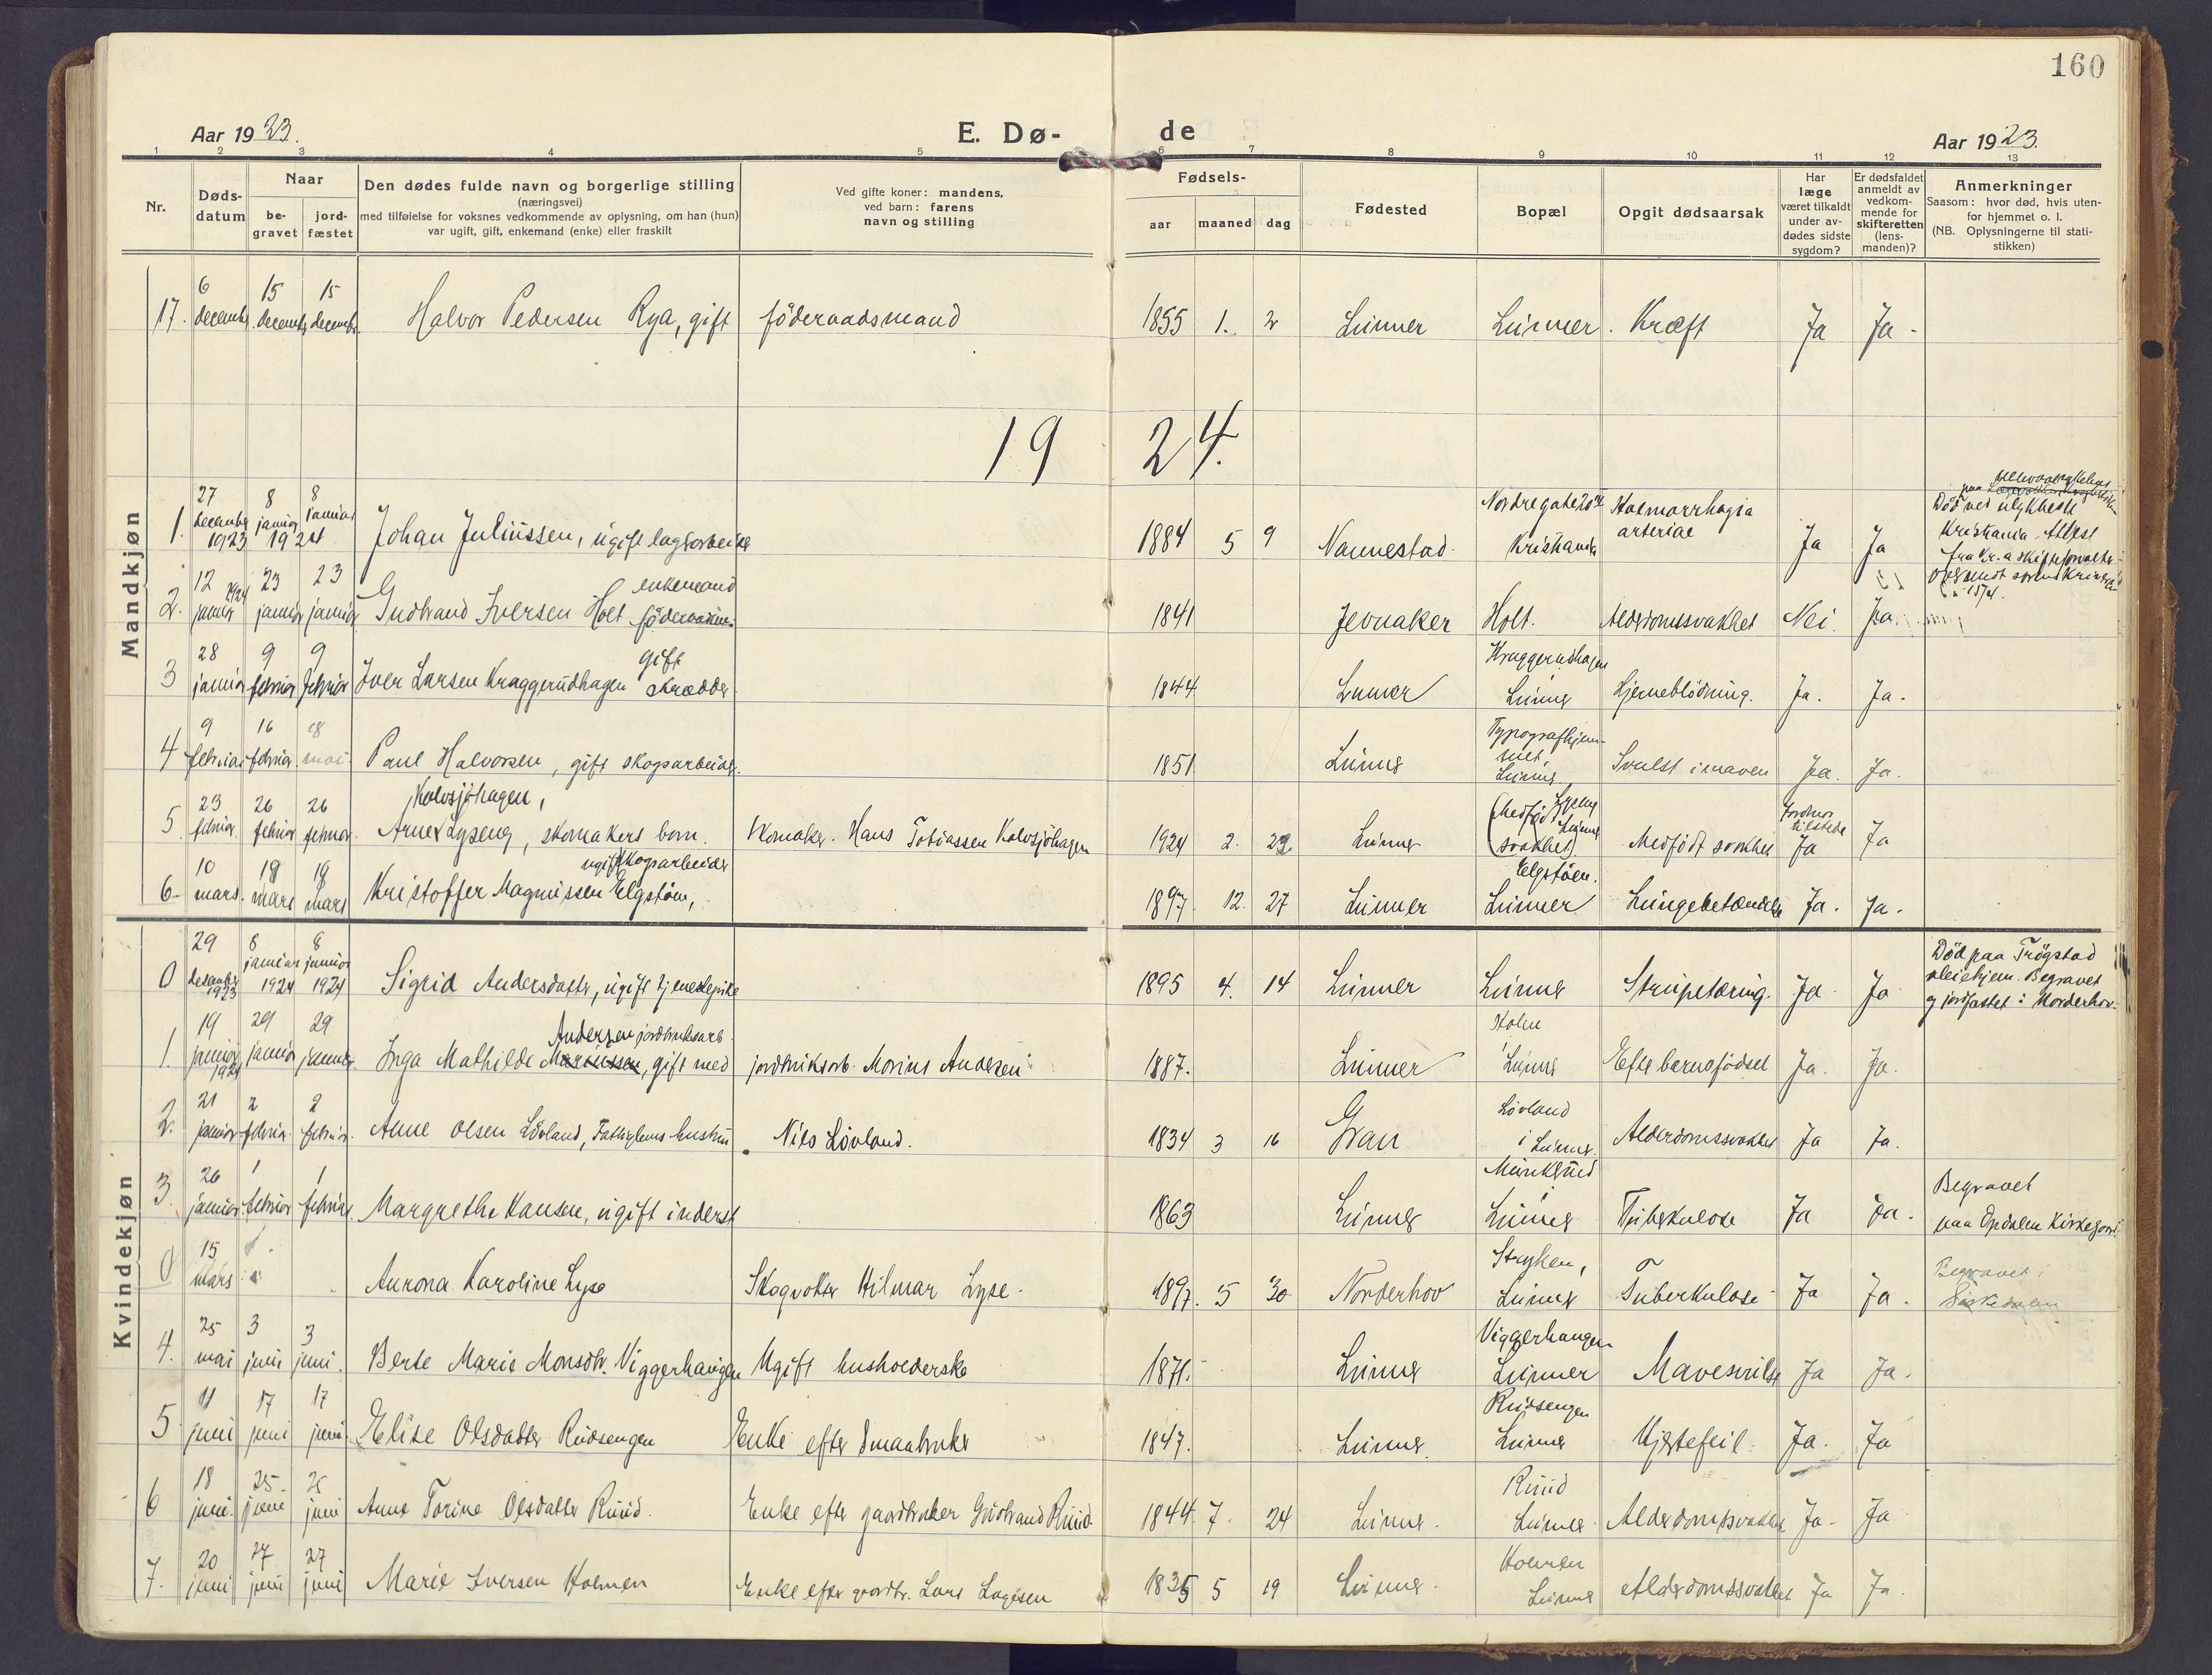 SAH, Lunner prestekontor, H/Ha/Haa/L0002: Ministerialbok nr. 2, 1922-1931, s. 160